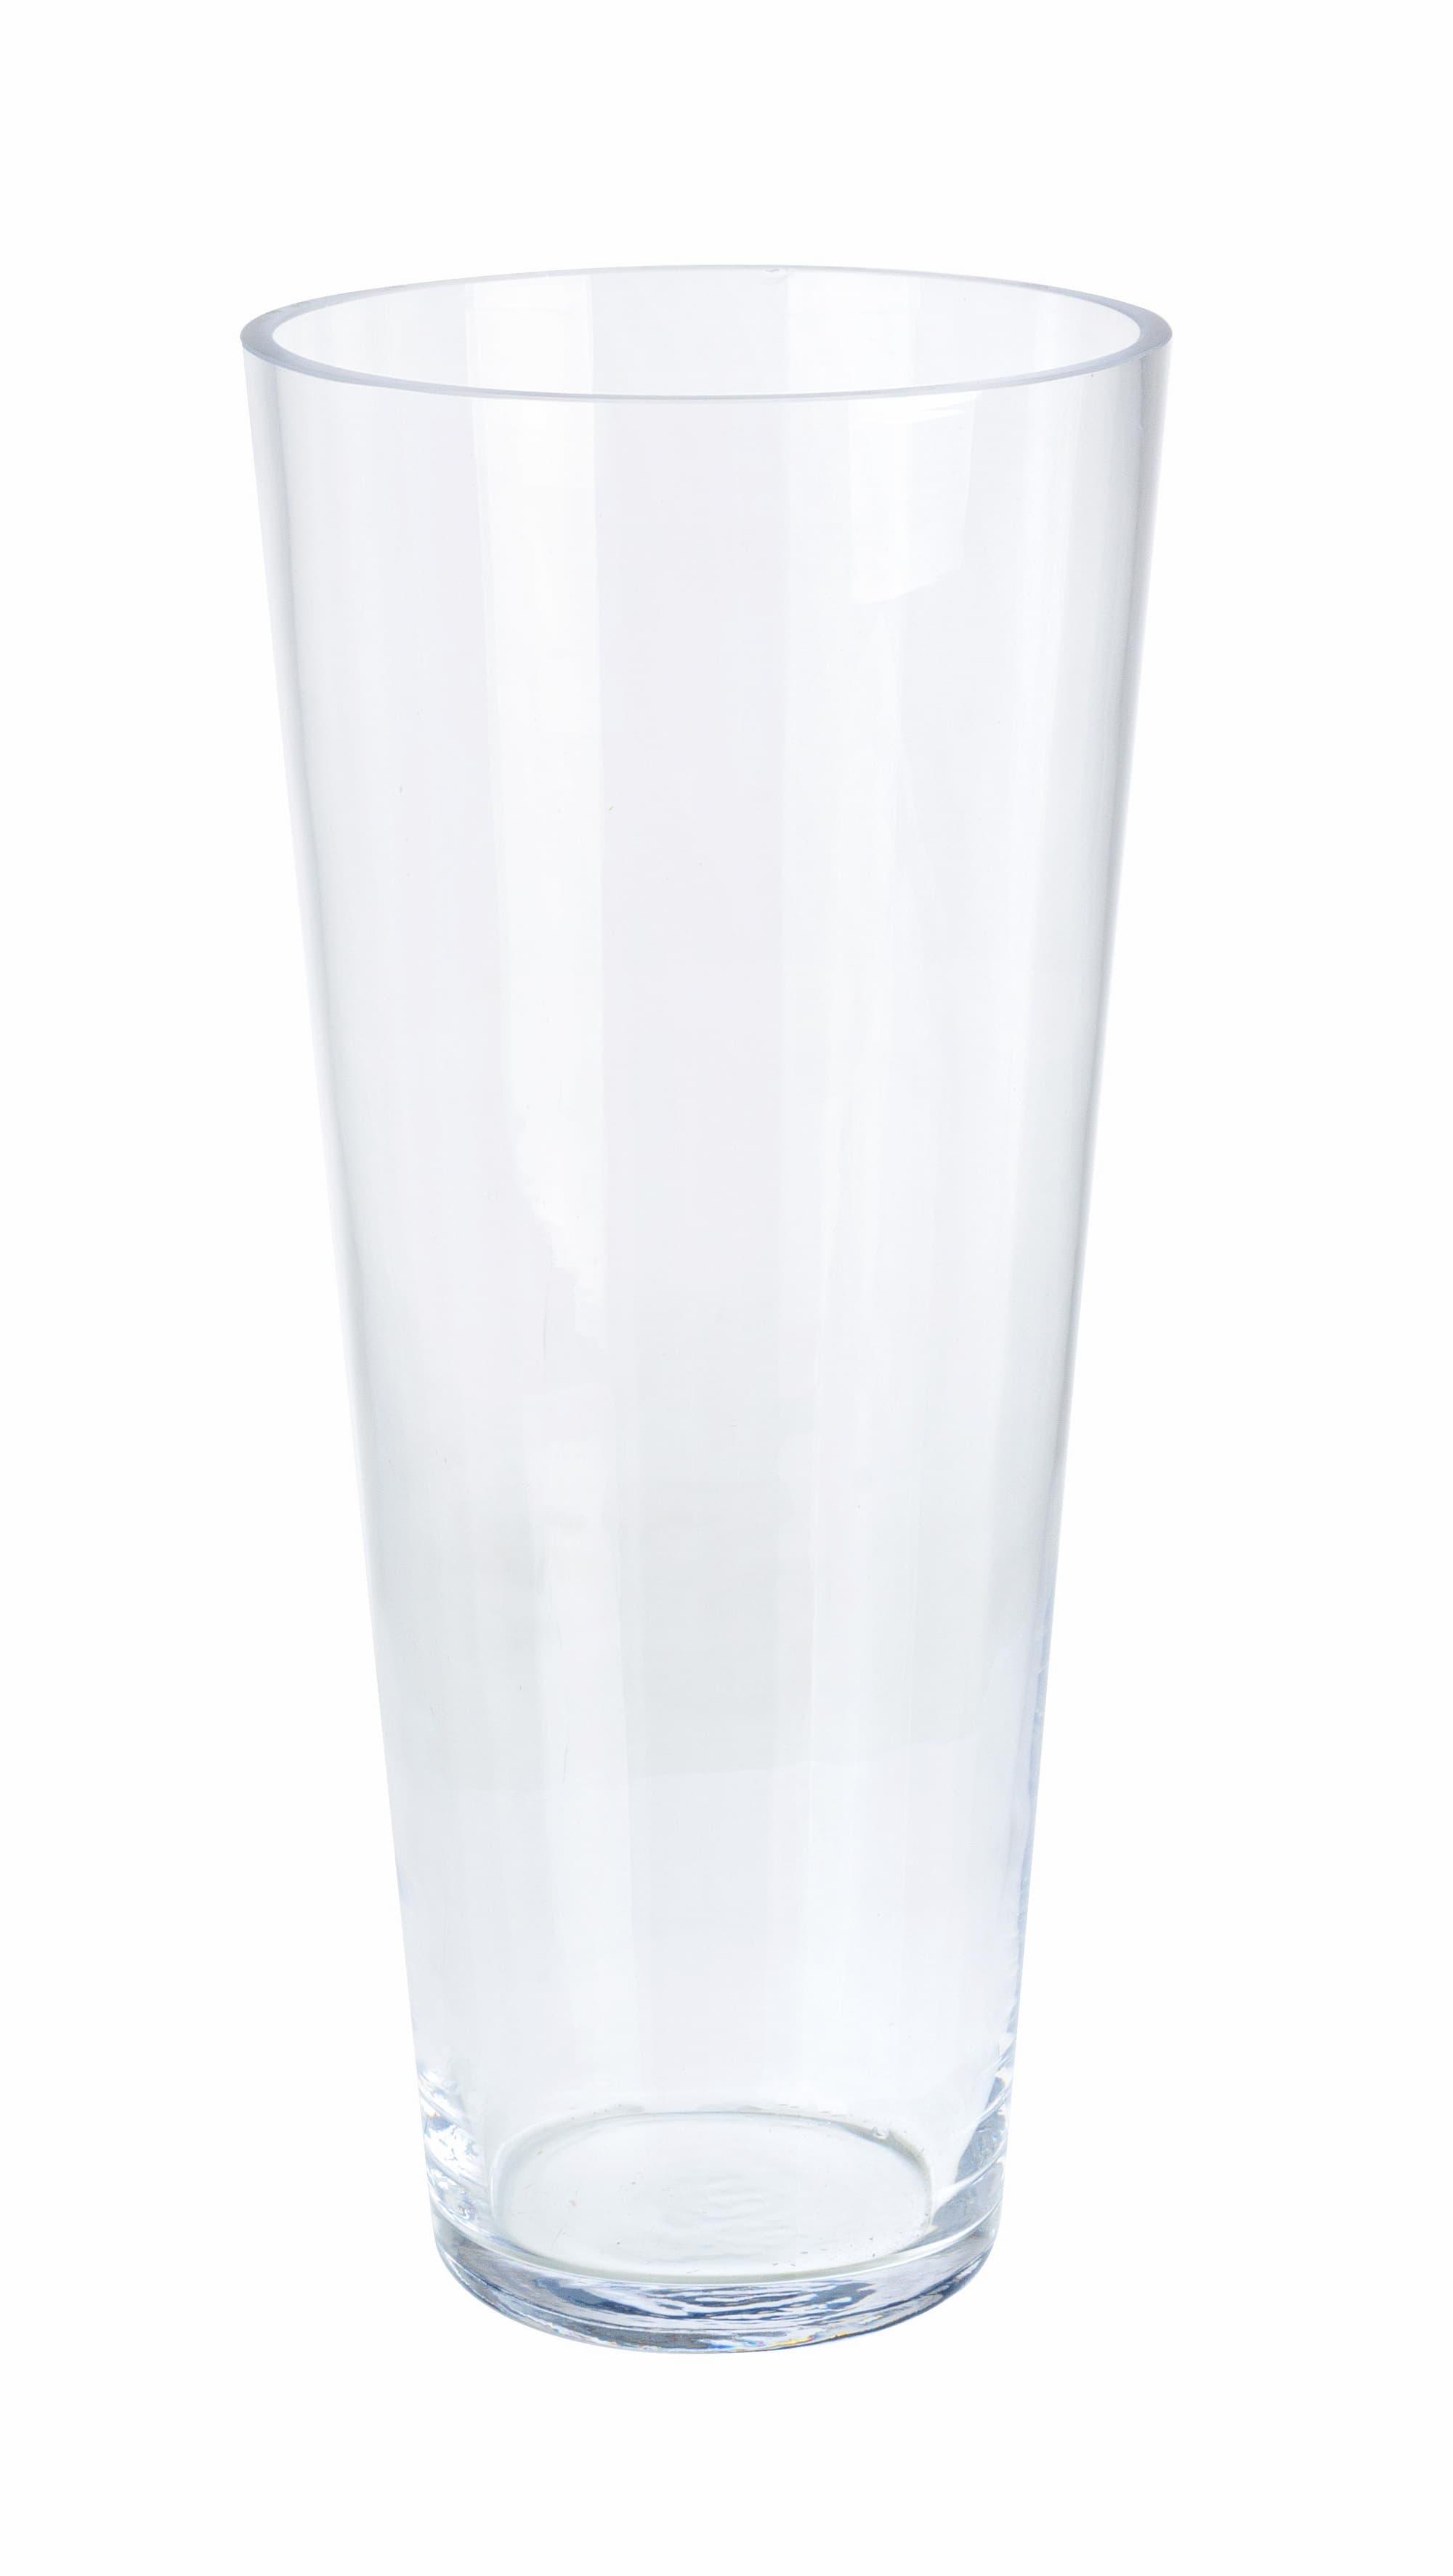 Vaza decorativa din sticla Venice Konic Transparent, Ø15xH40 cm